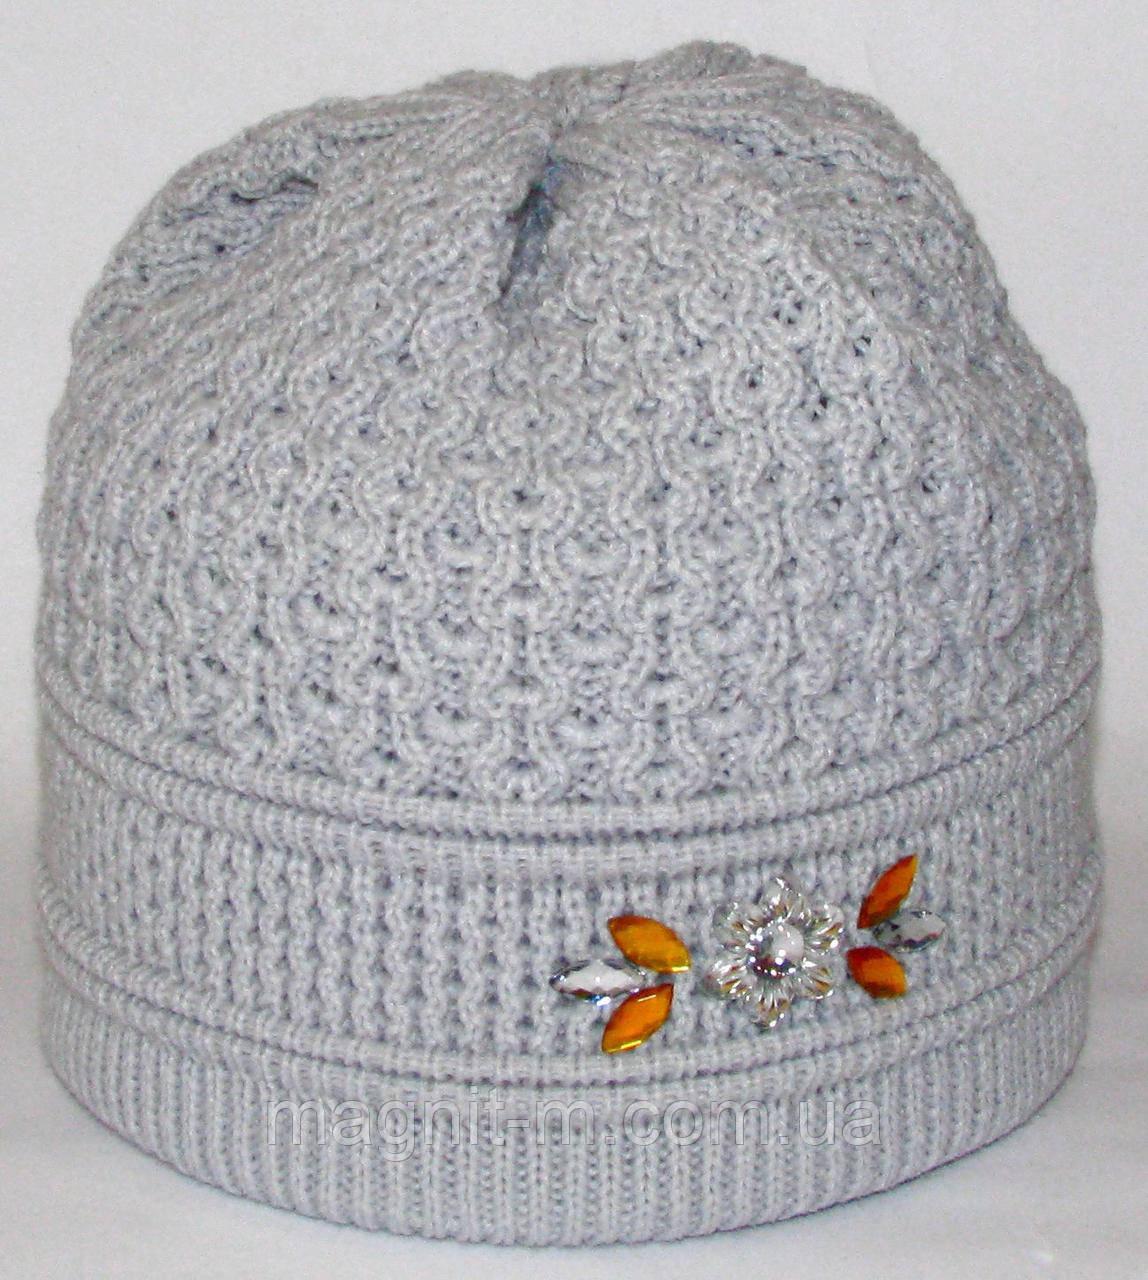 Женская зимняя шапка. Двойная вязка. Серая.